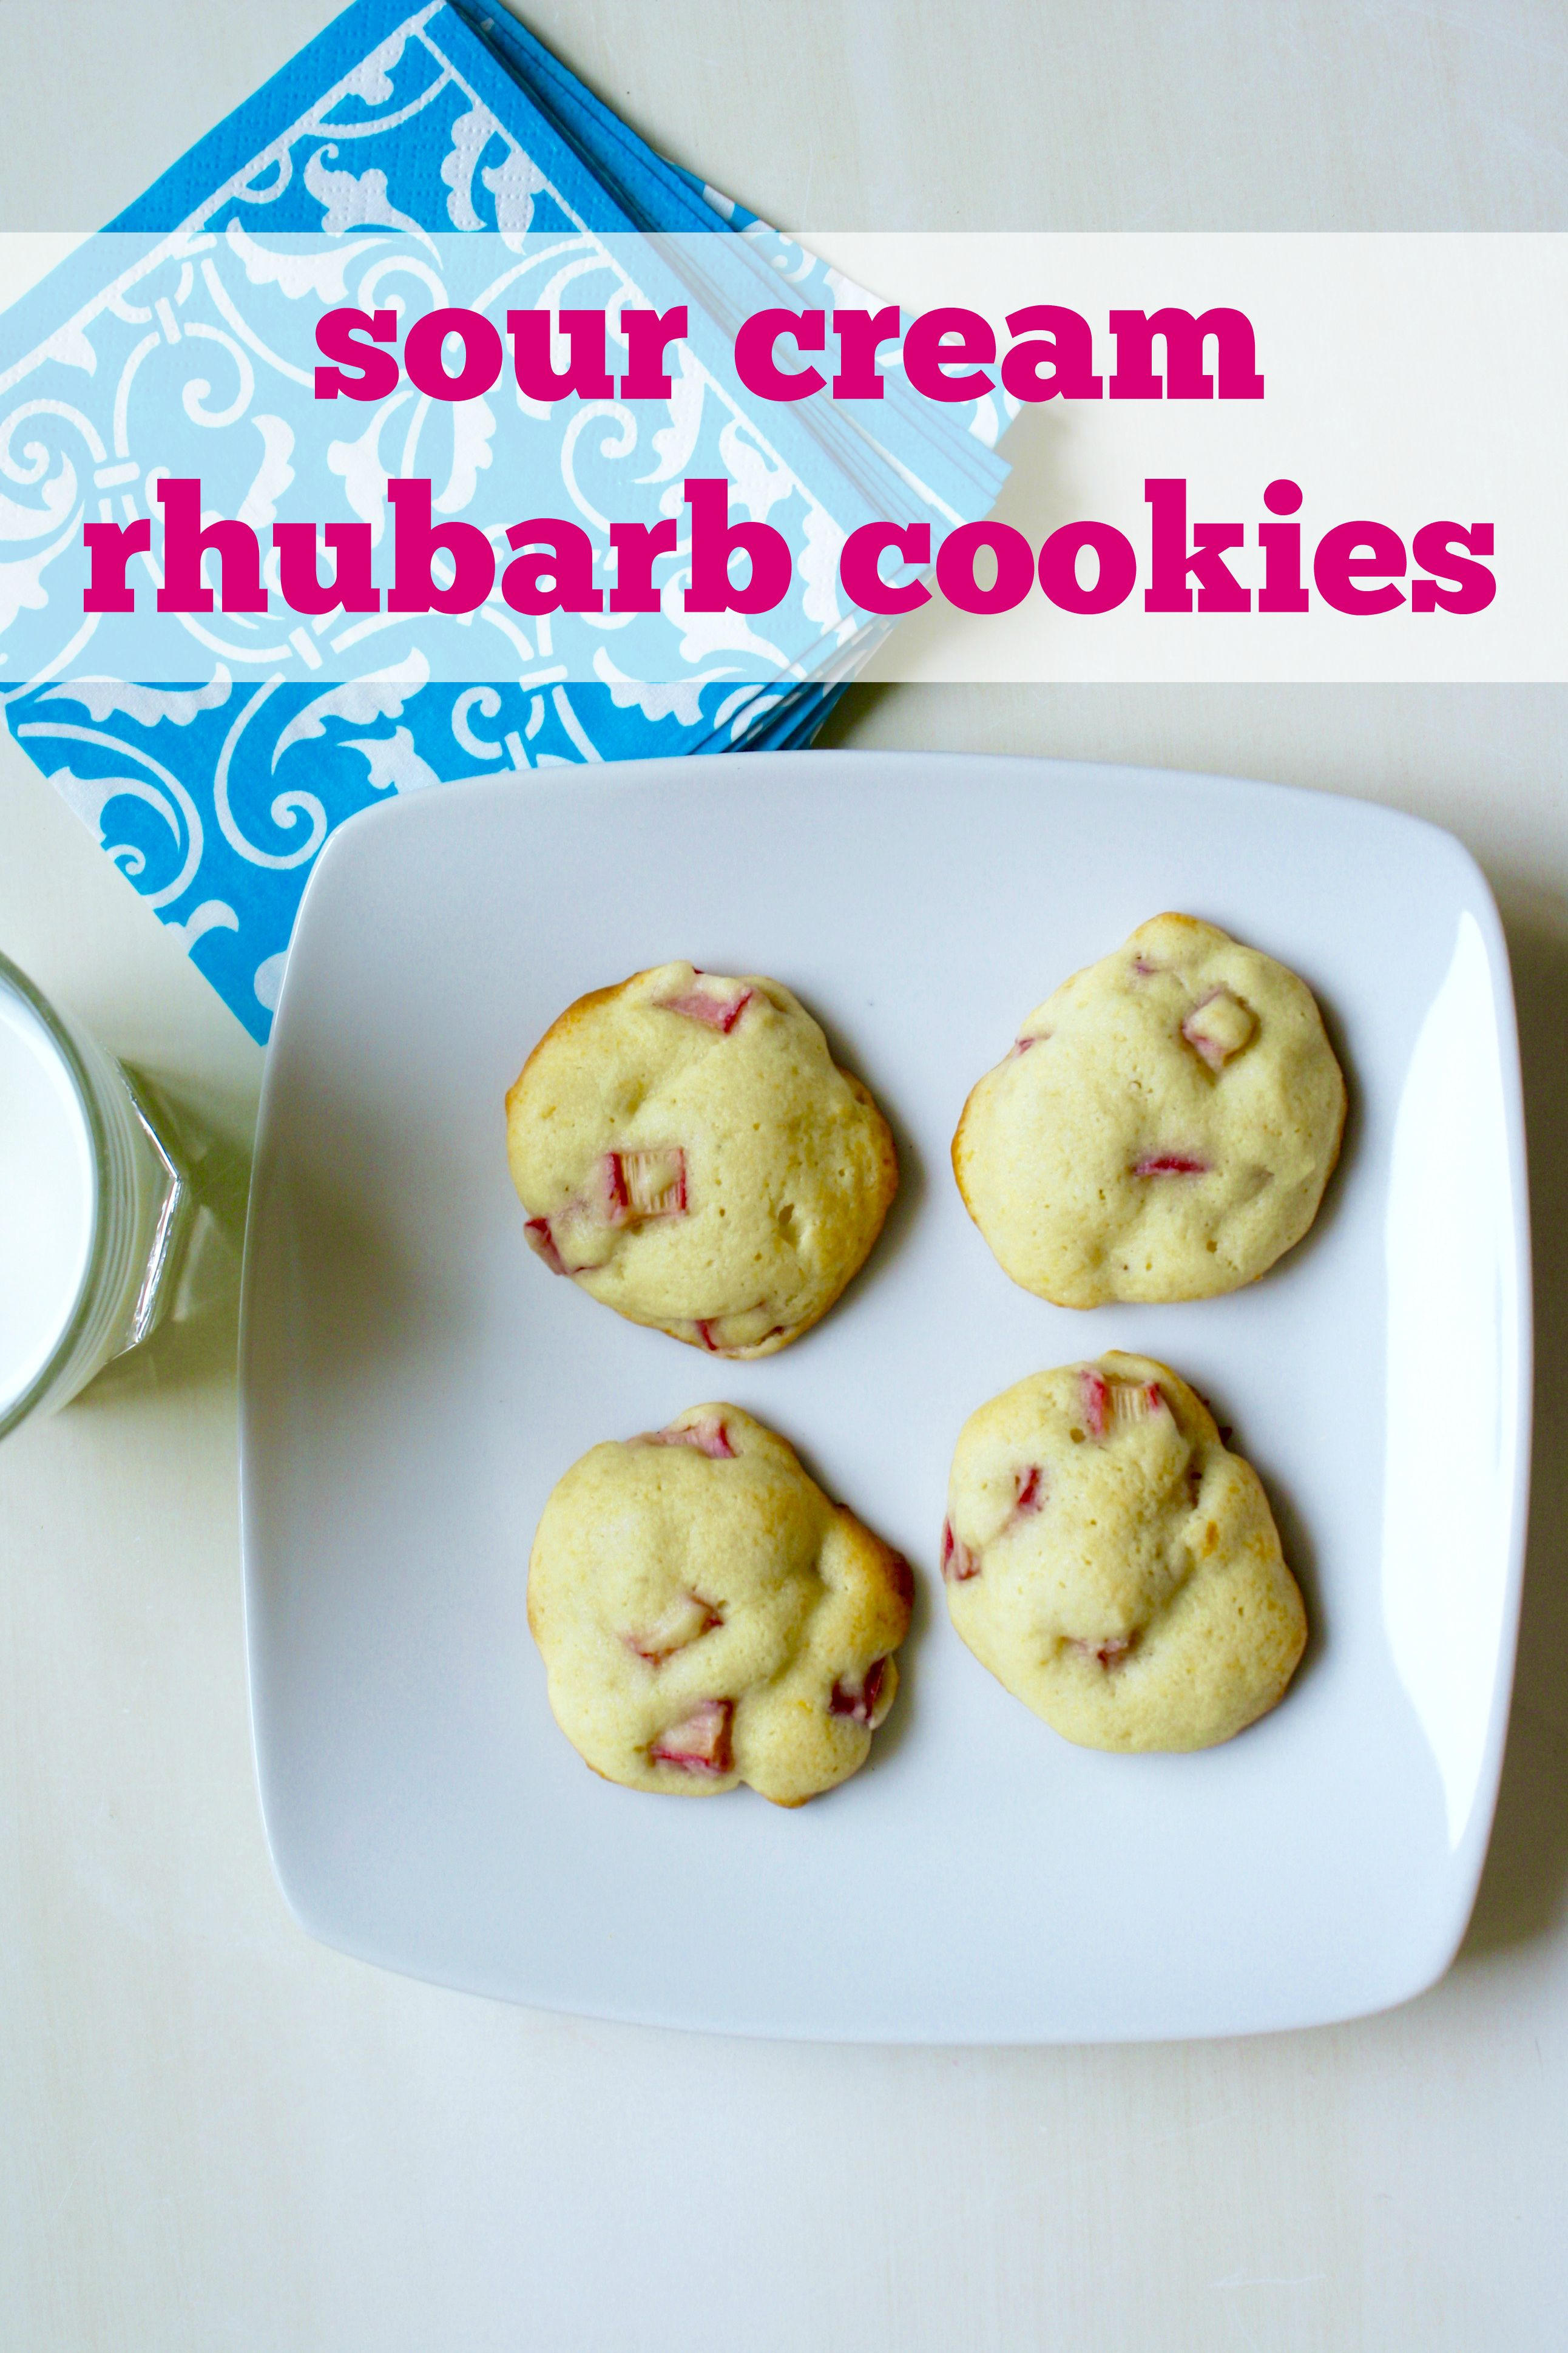 Sour Cream Rhubarb Cookies Recipe Rhubarb Cookies Rhubarb Bakery Recipes